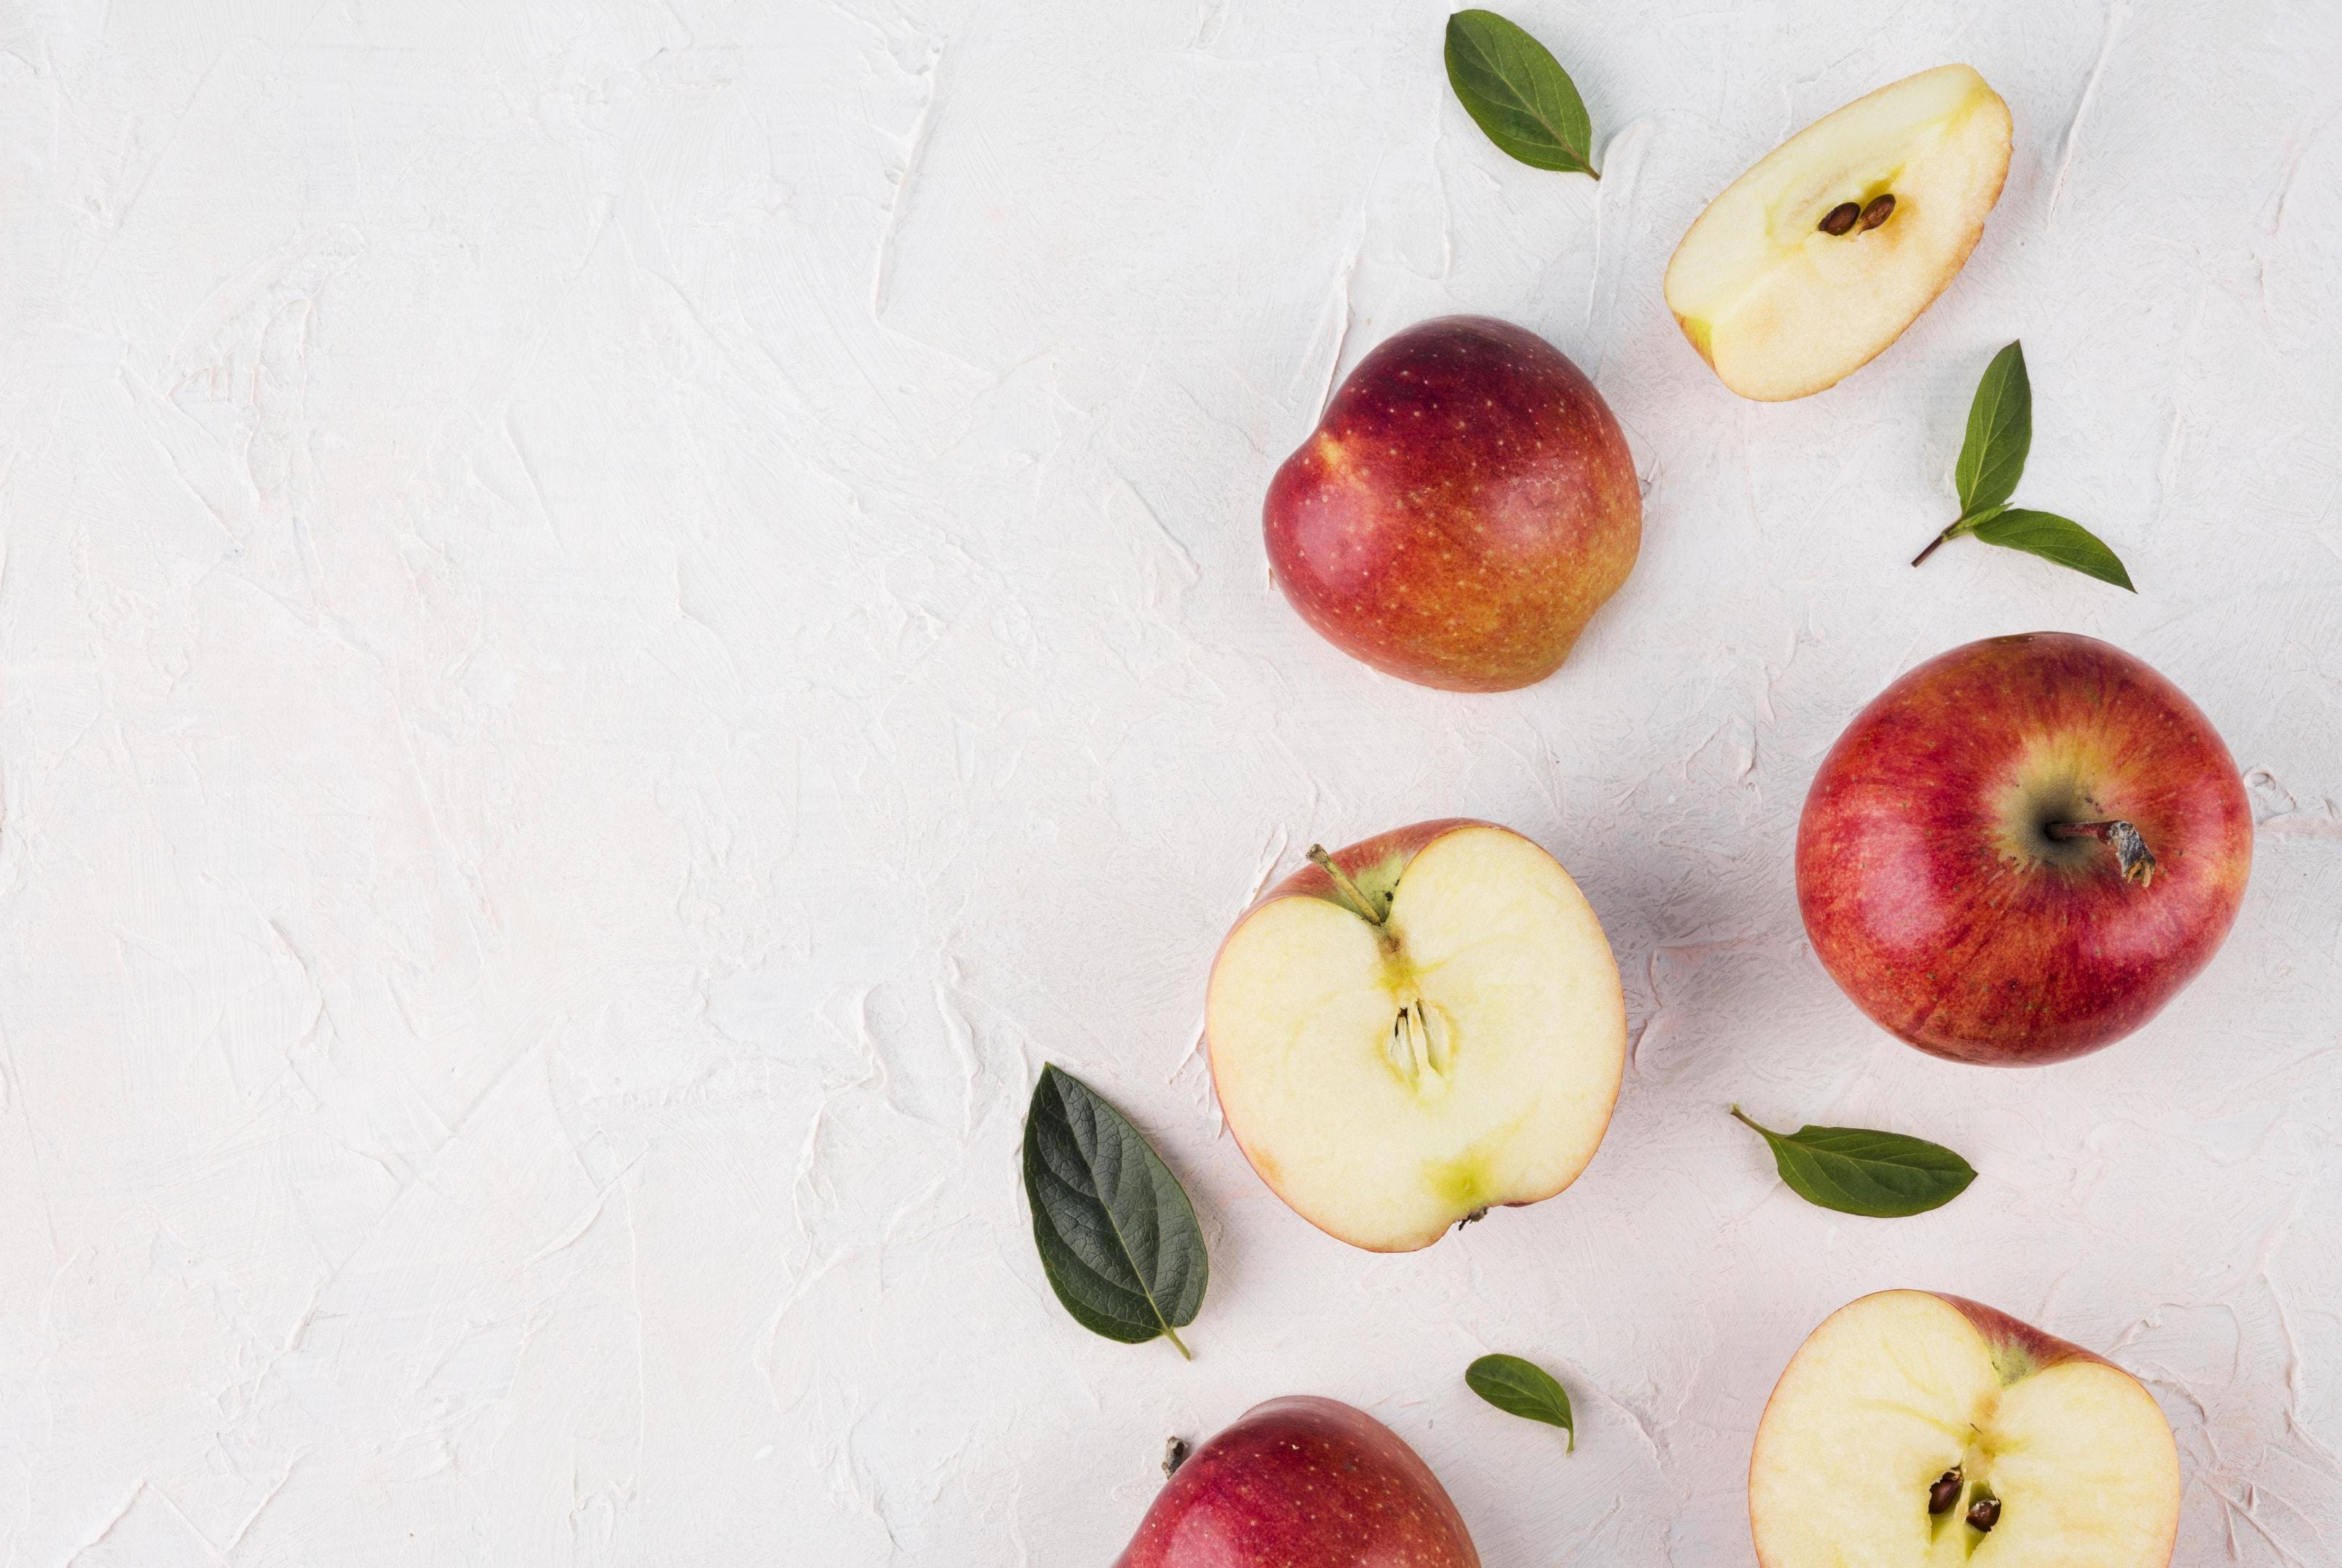 Assortment of apples on light background